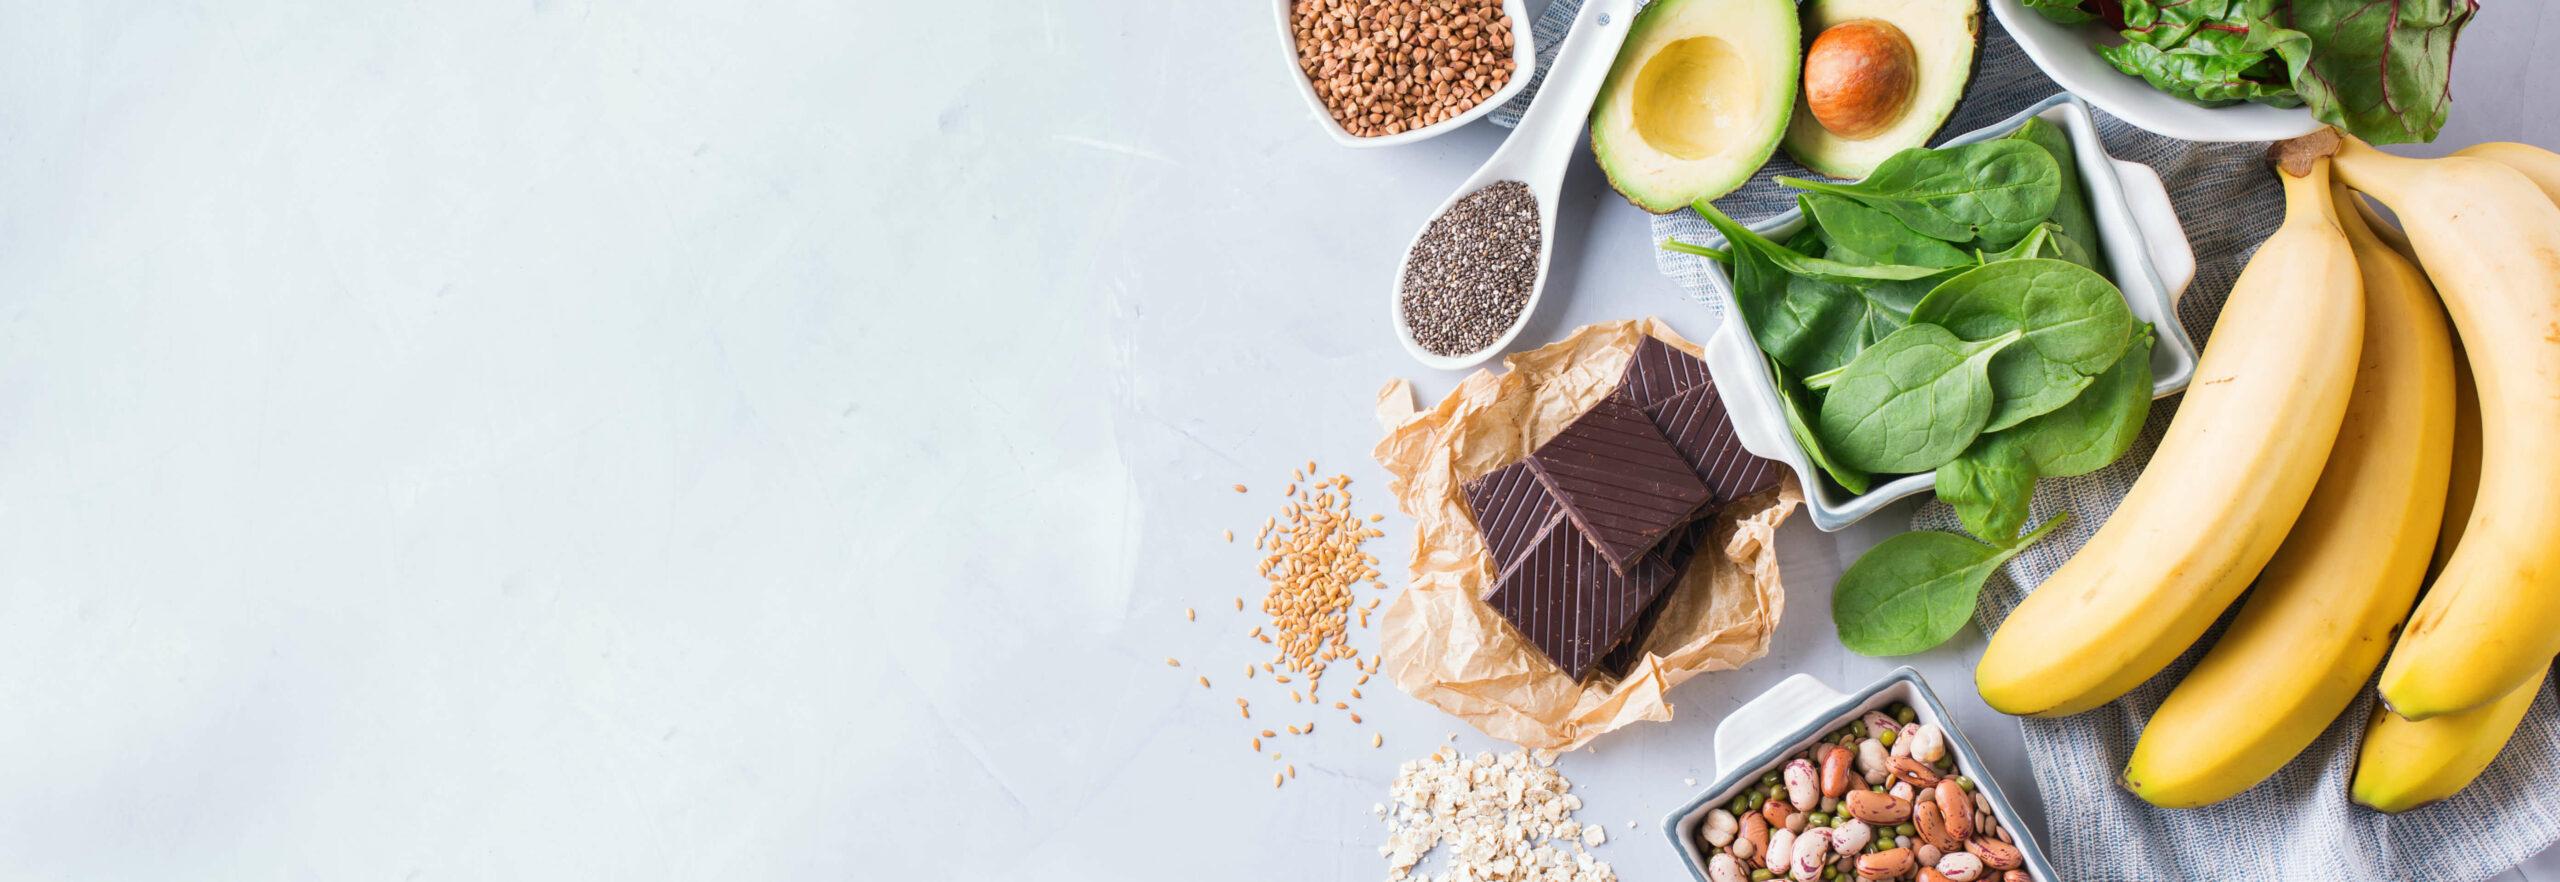 Chocola, spinazie, avocado, zaden